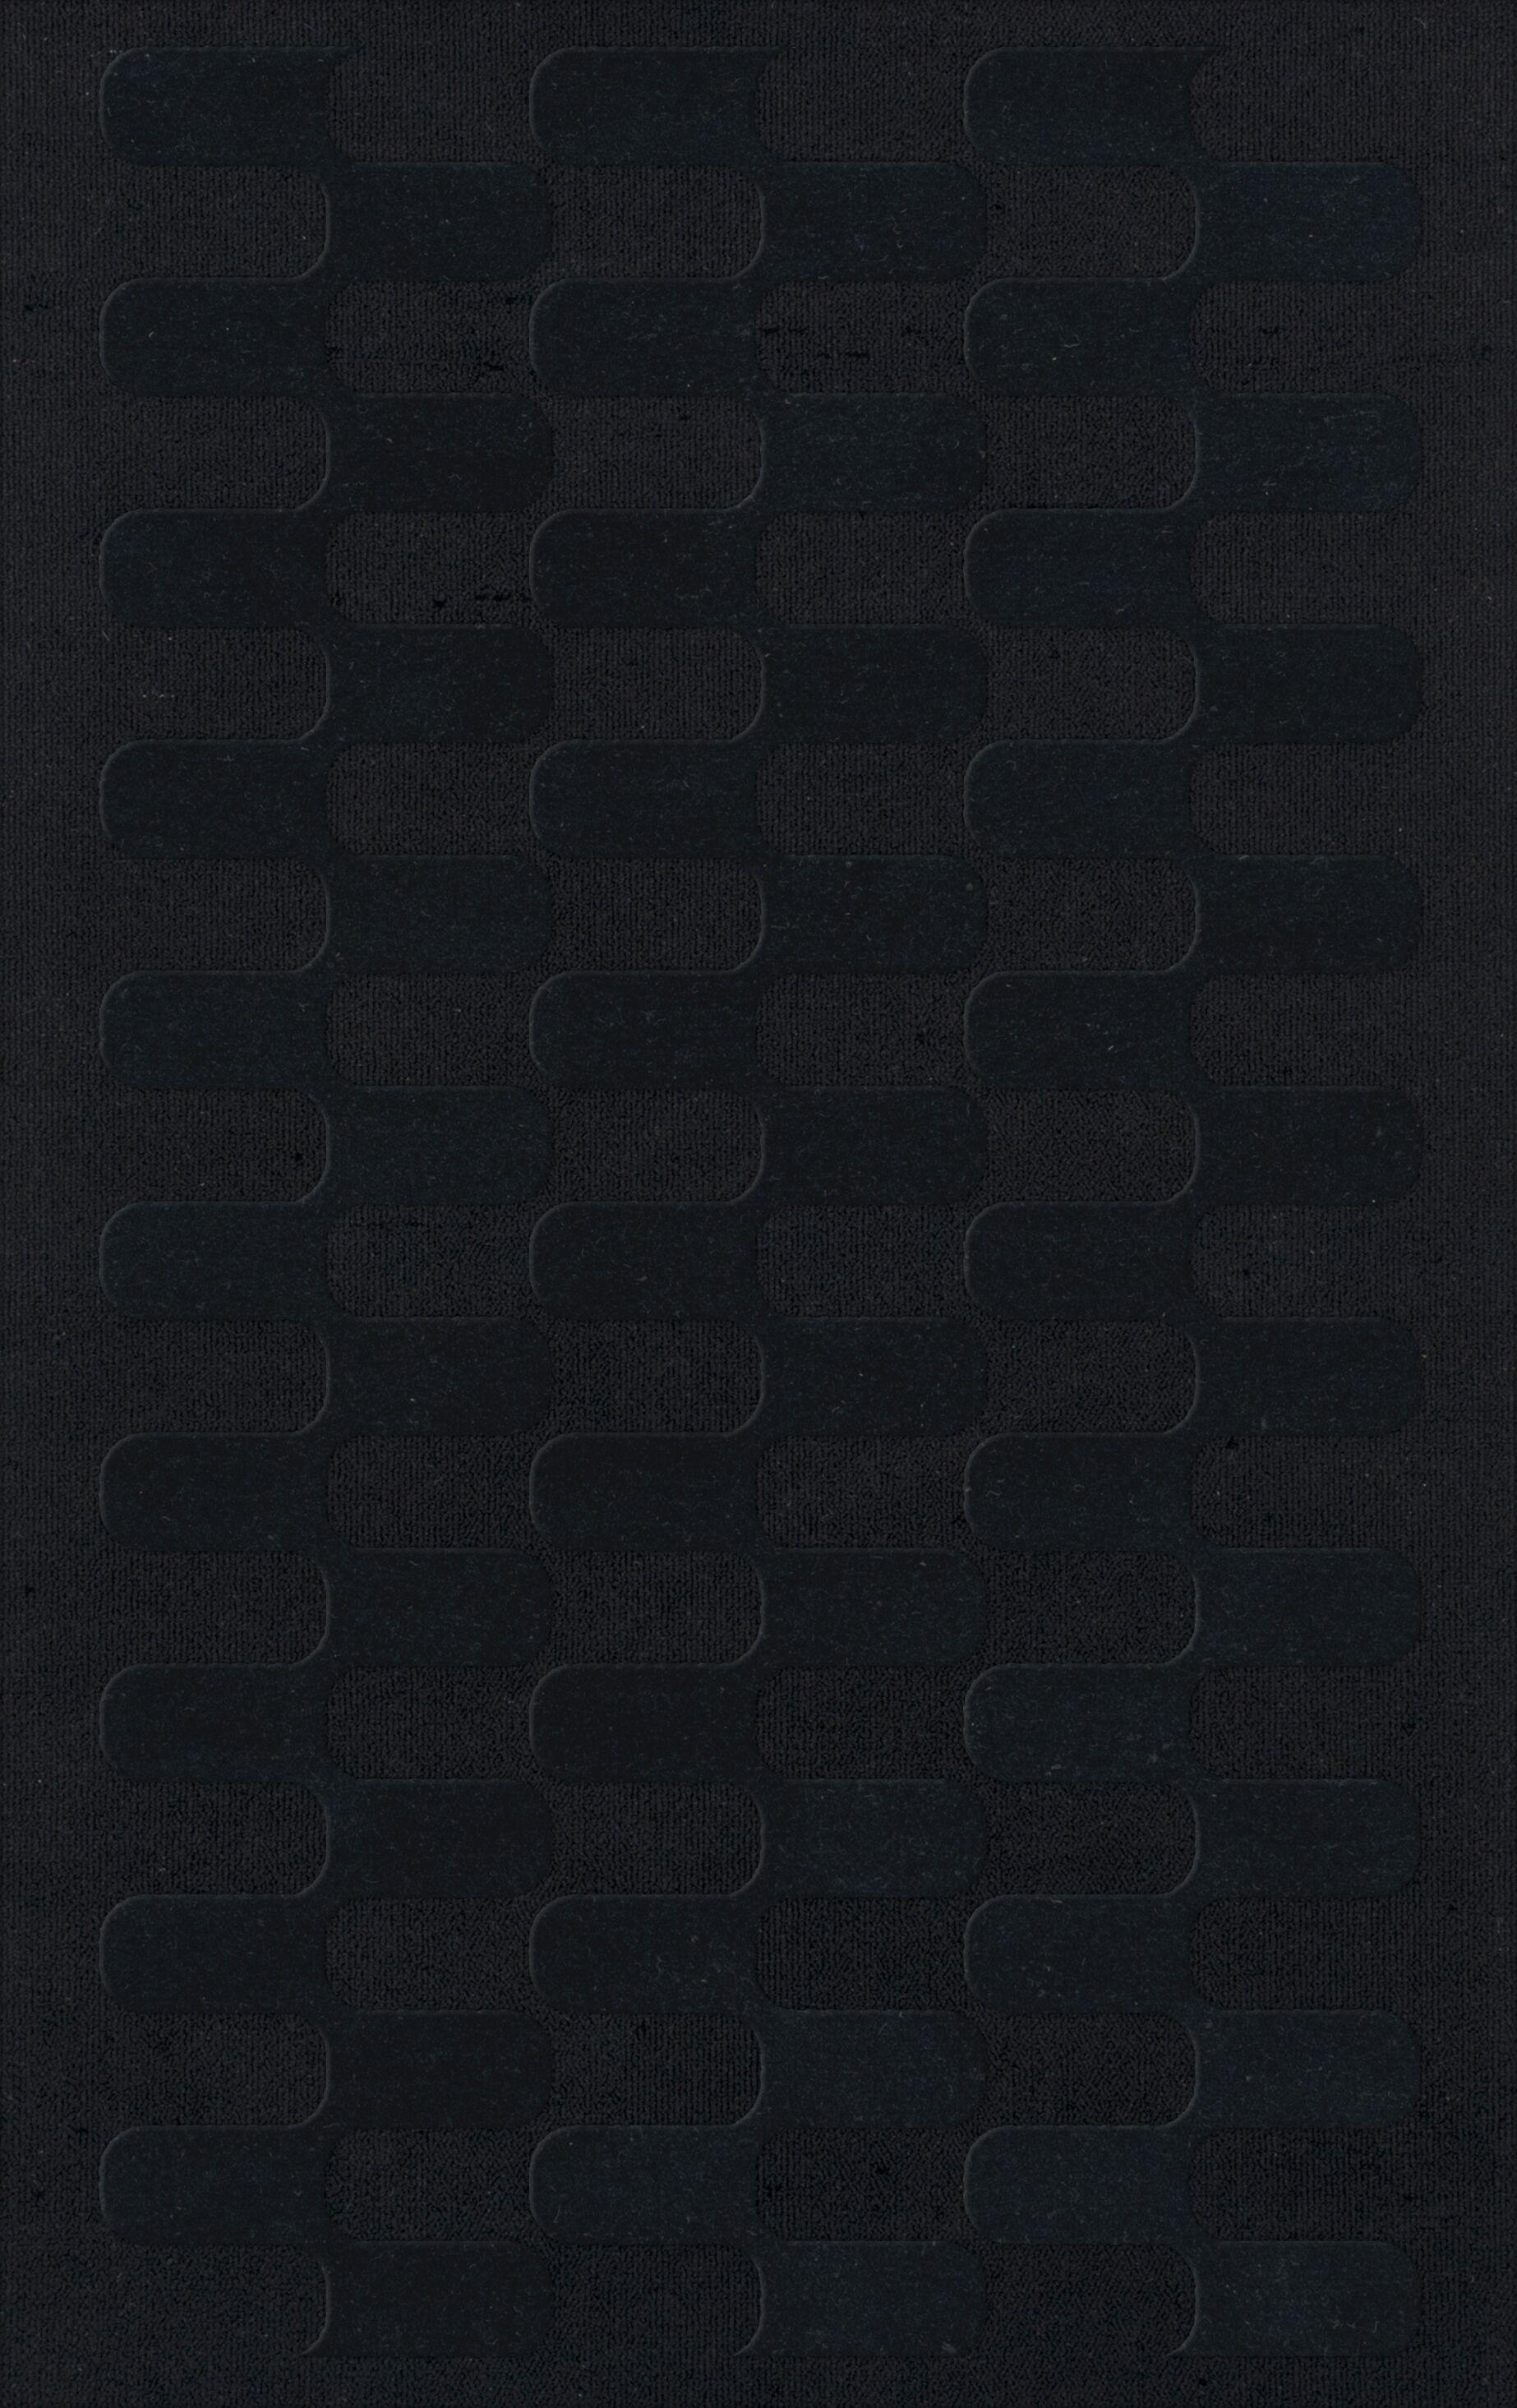 Dover Black Area Rug Rug Size: Rectangle 12' x 18'